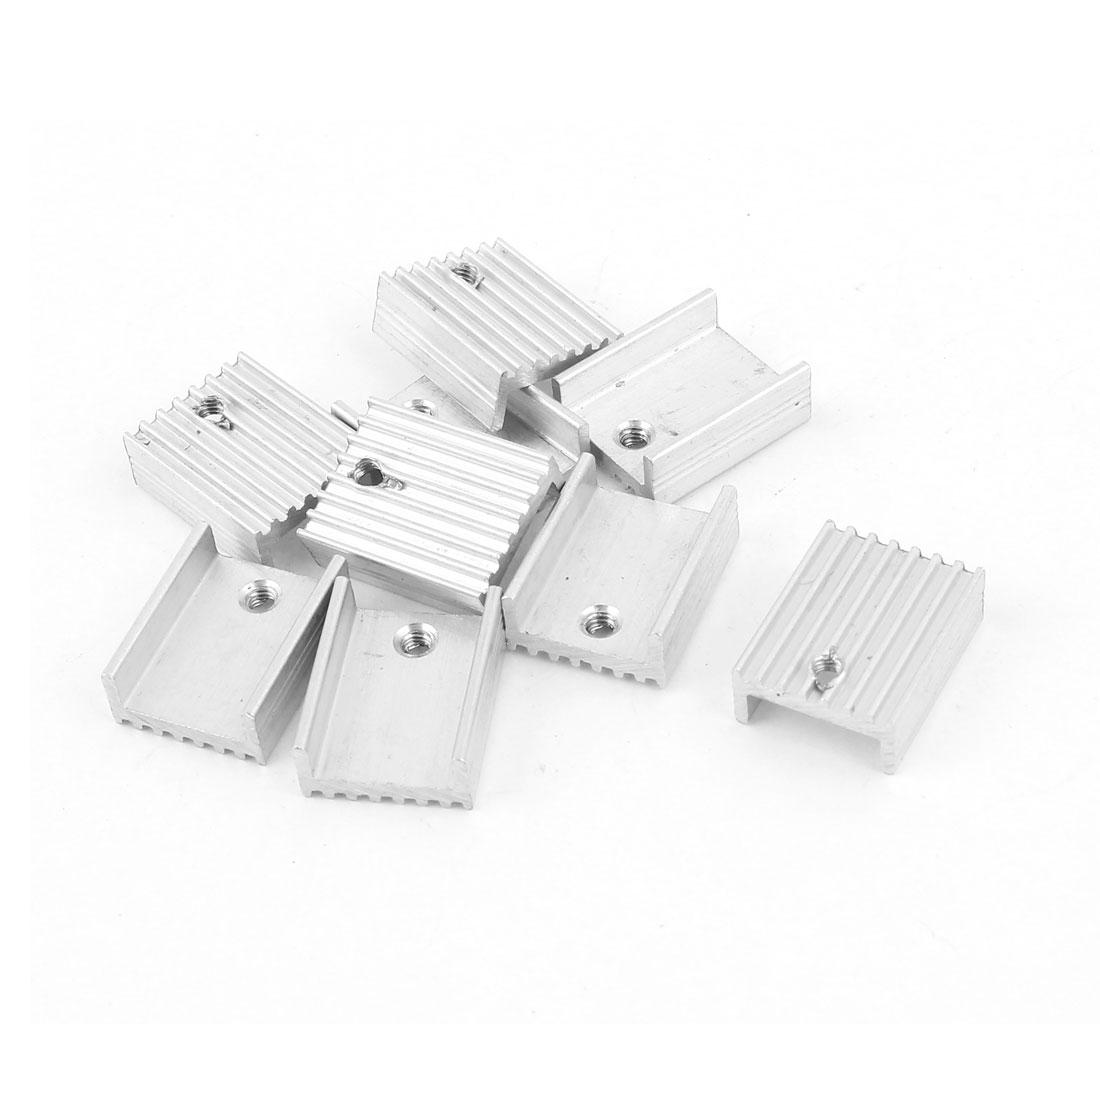 9PCS 20 x 15 x 8 mm Aluminum Heat Sink For LED Electronic Components